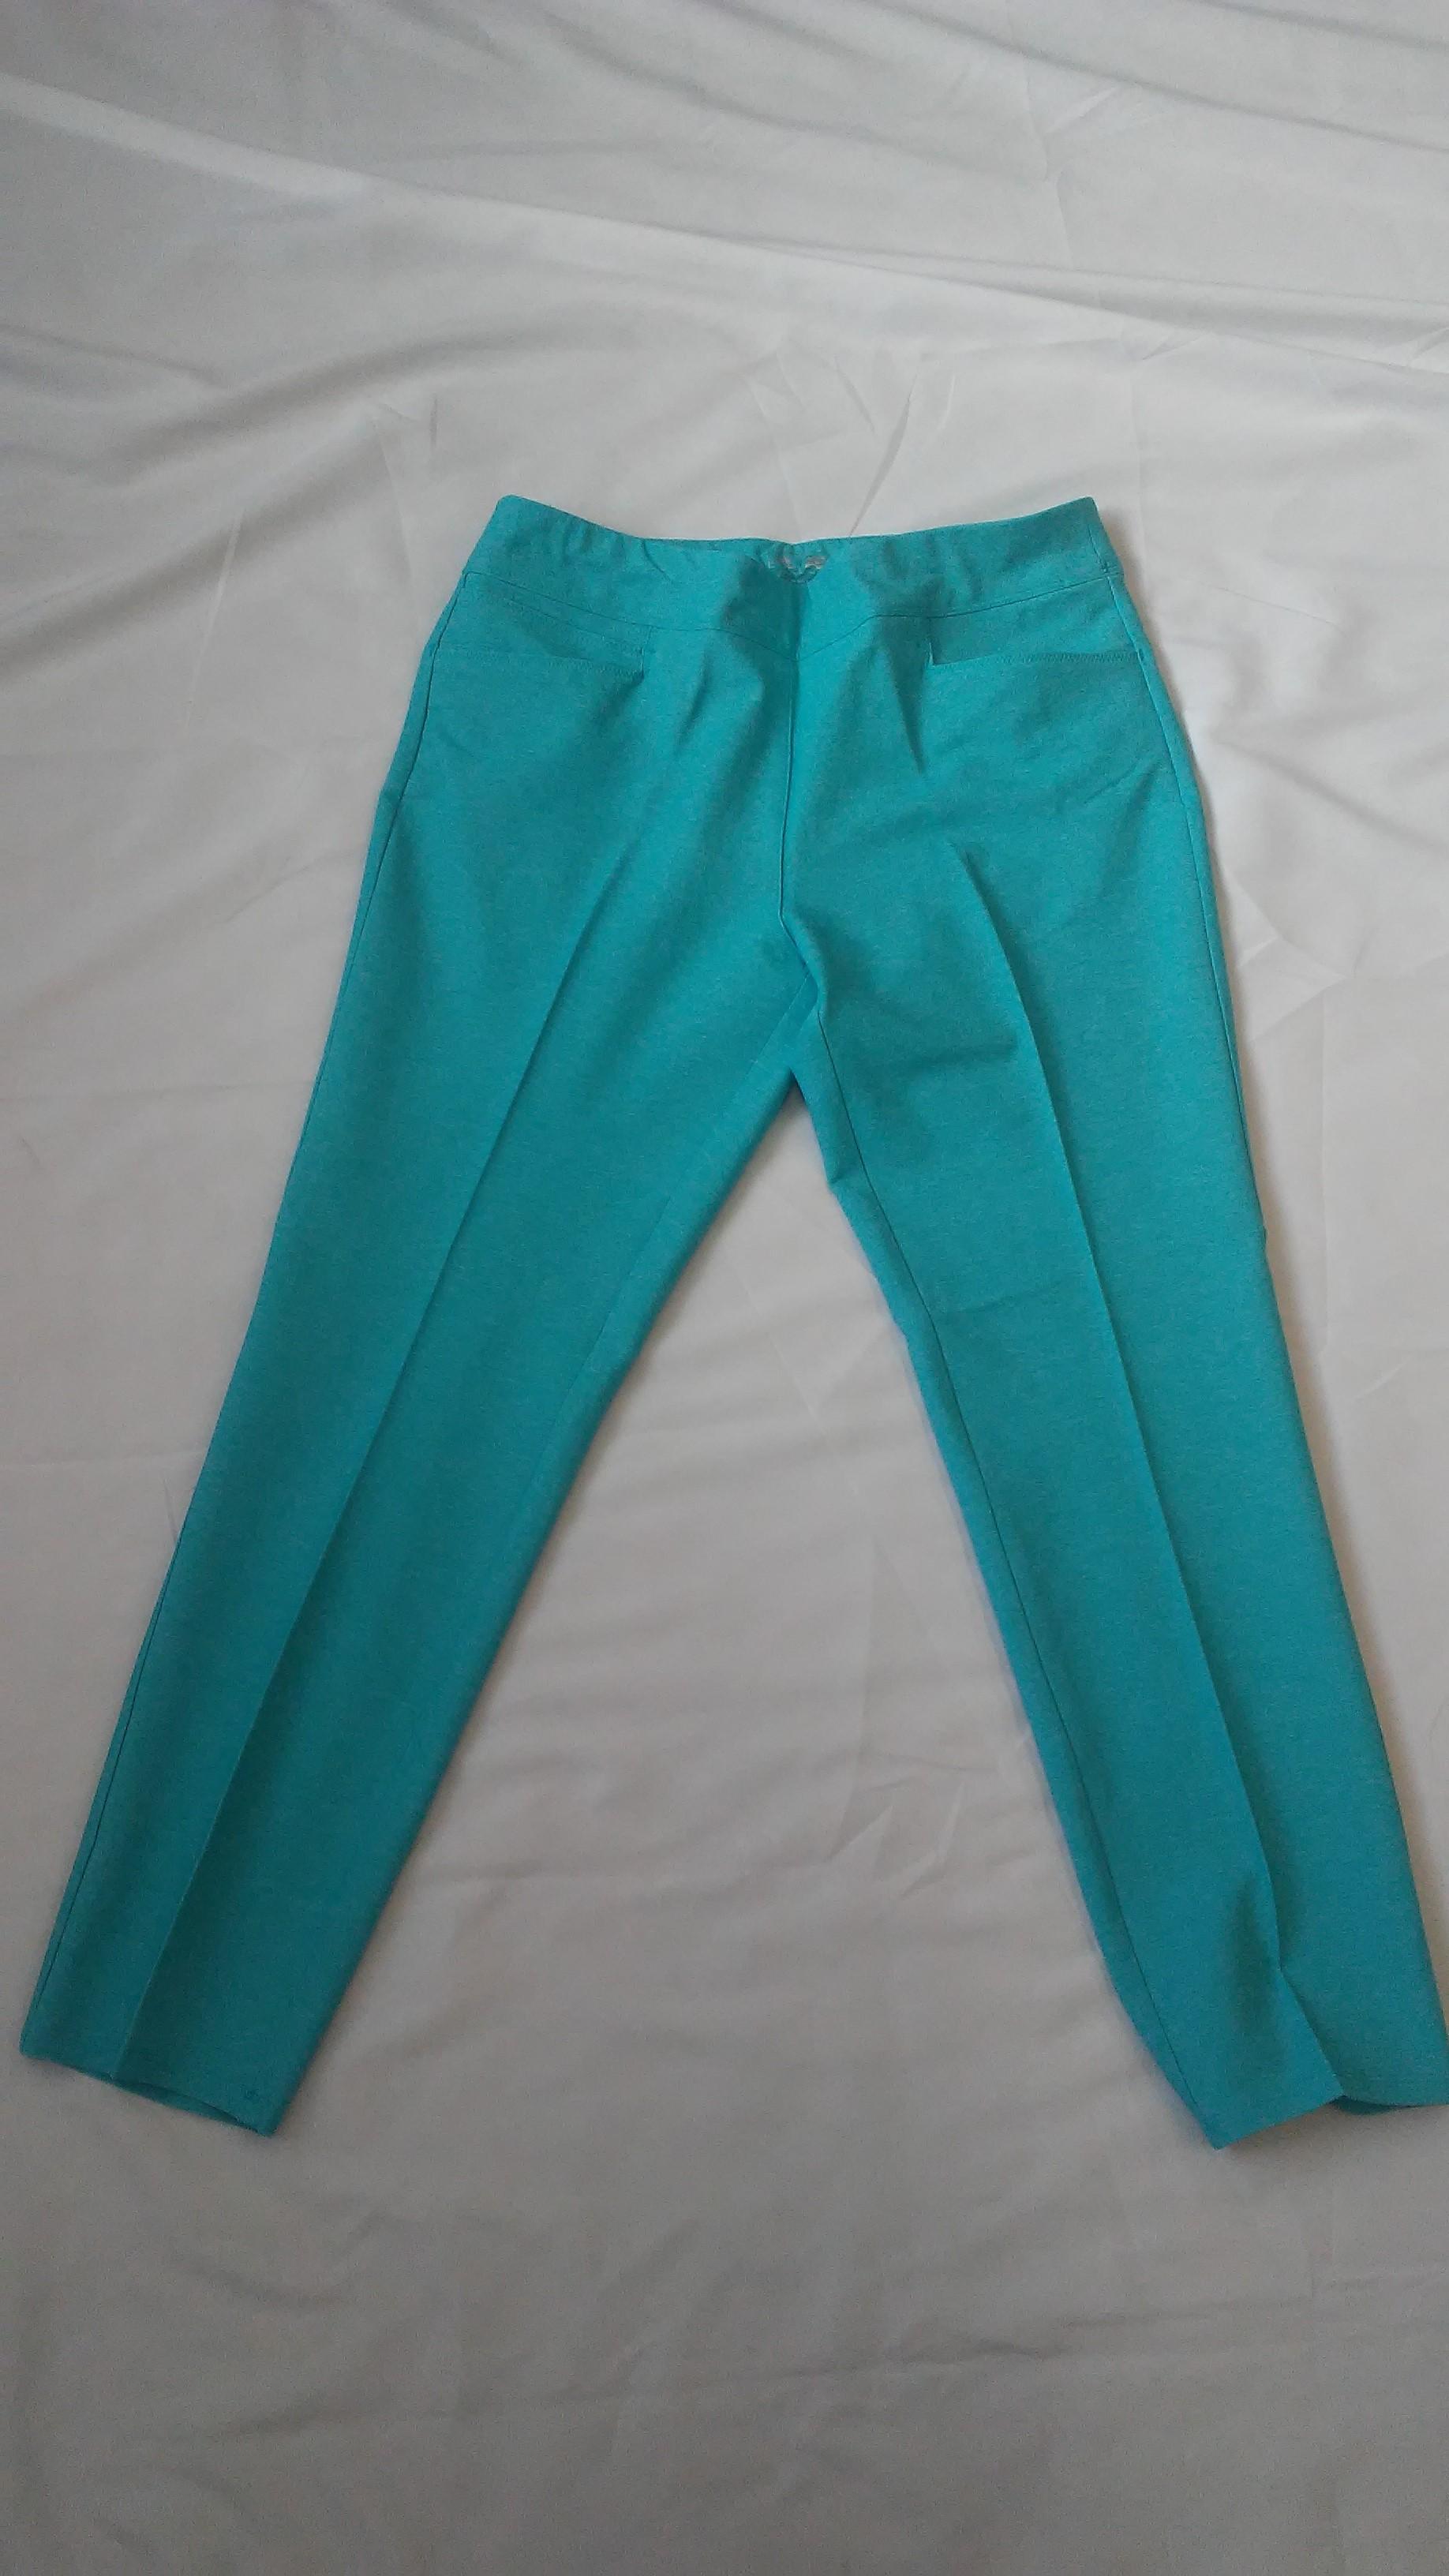 adidas jeans energy blue